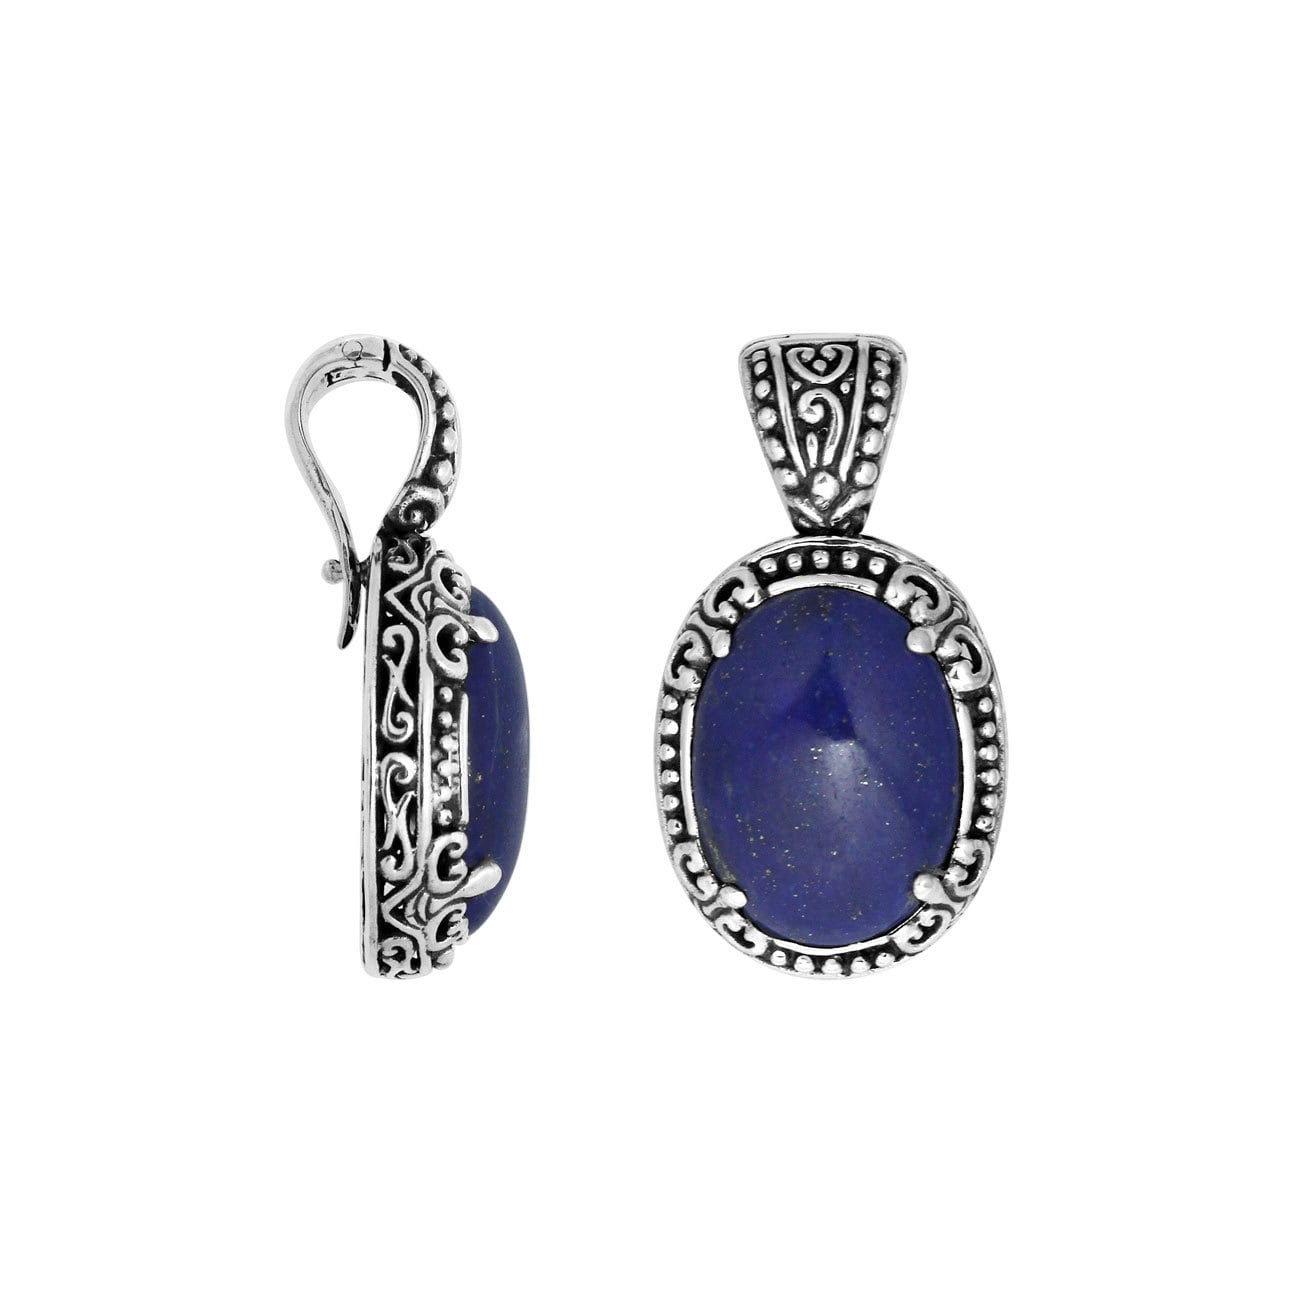 Handmade Sterling Silver Oval Lapis Lazuli Clip-on Enhanc...